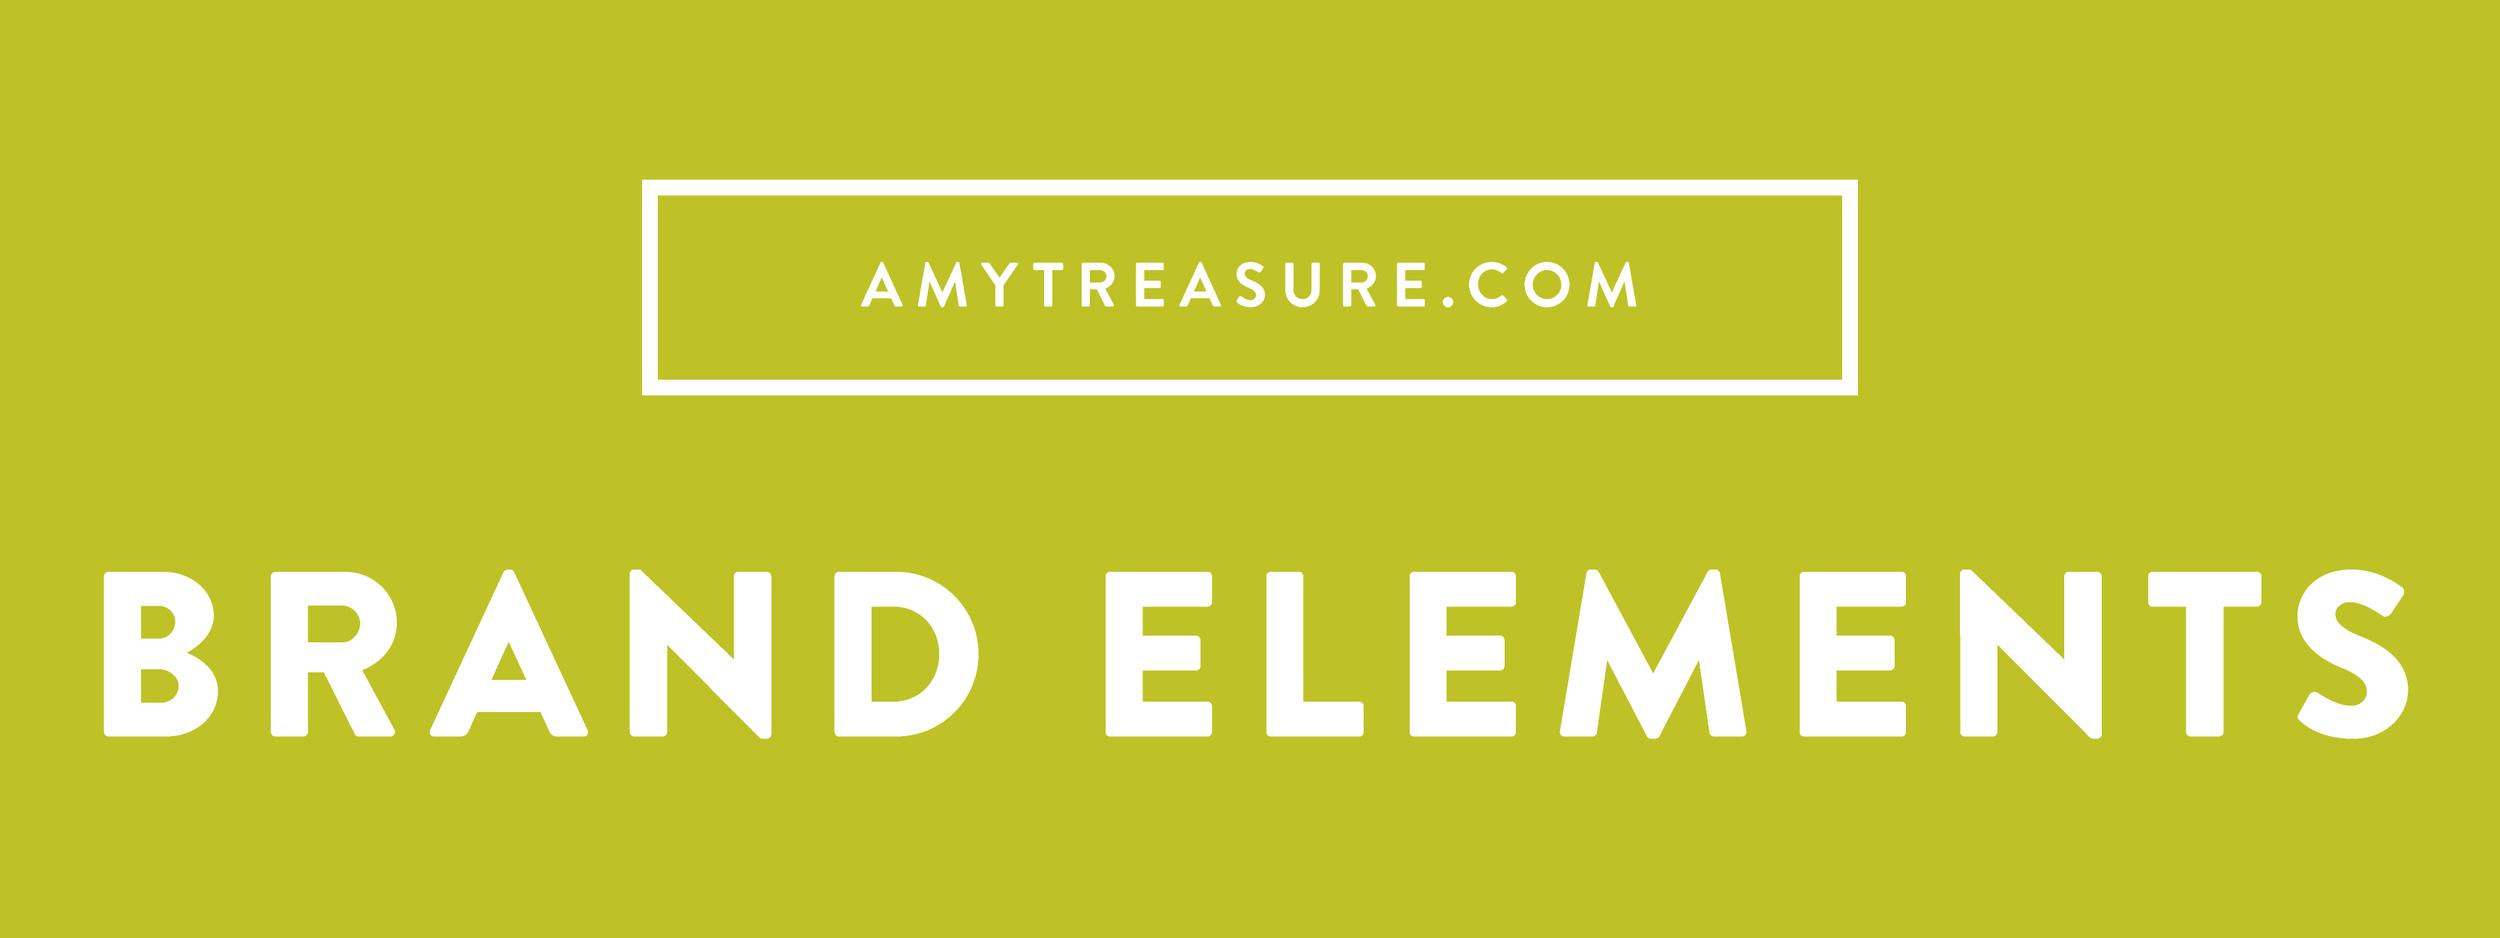 Brand Elements Header.png